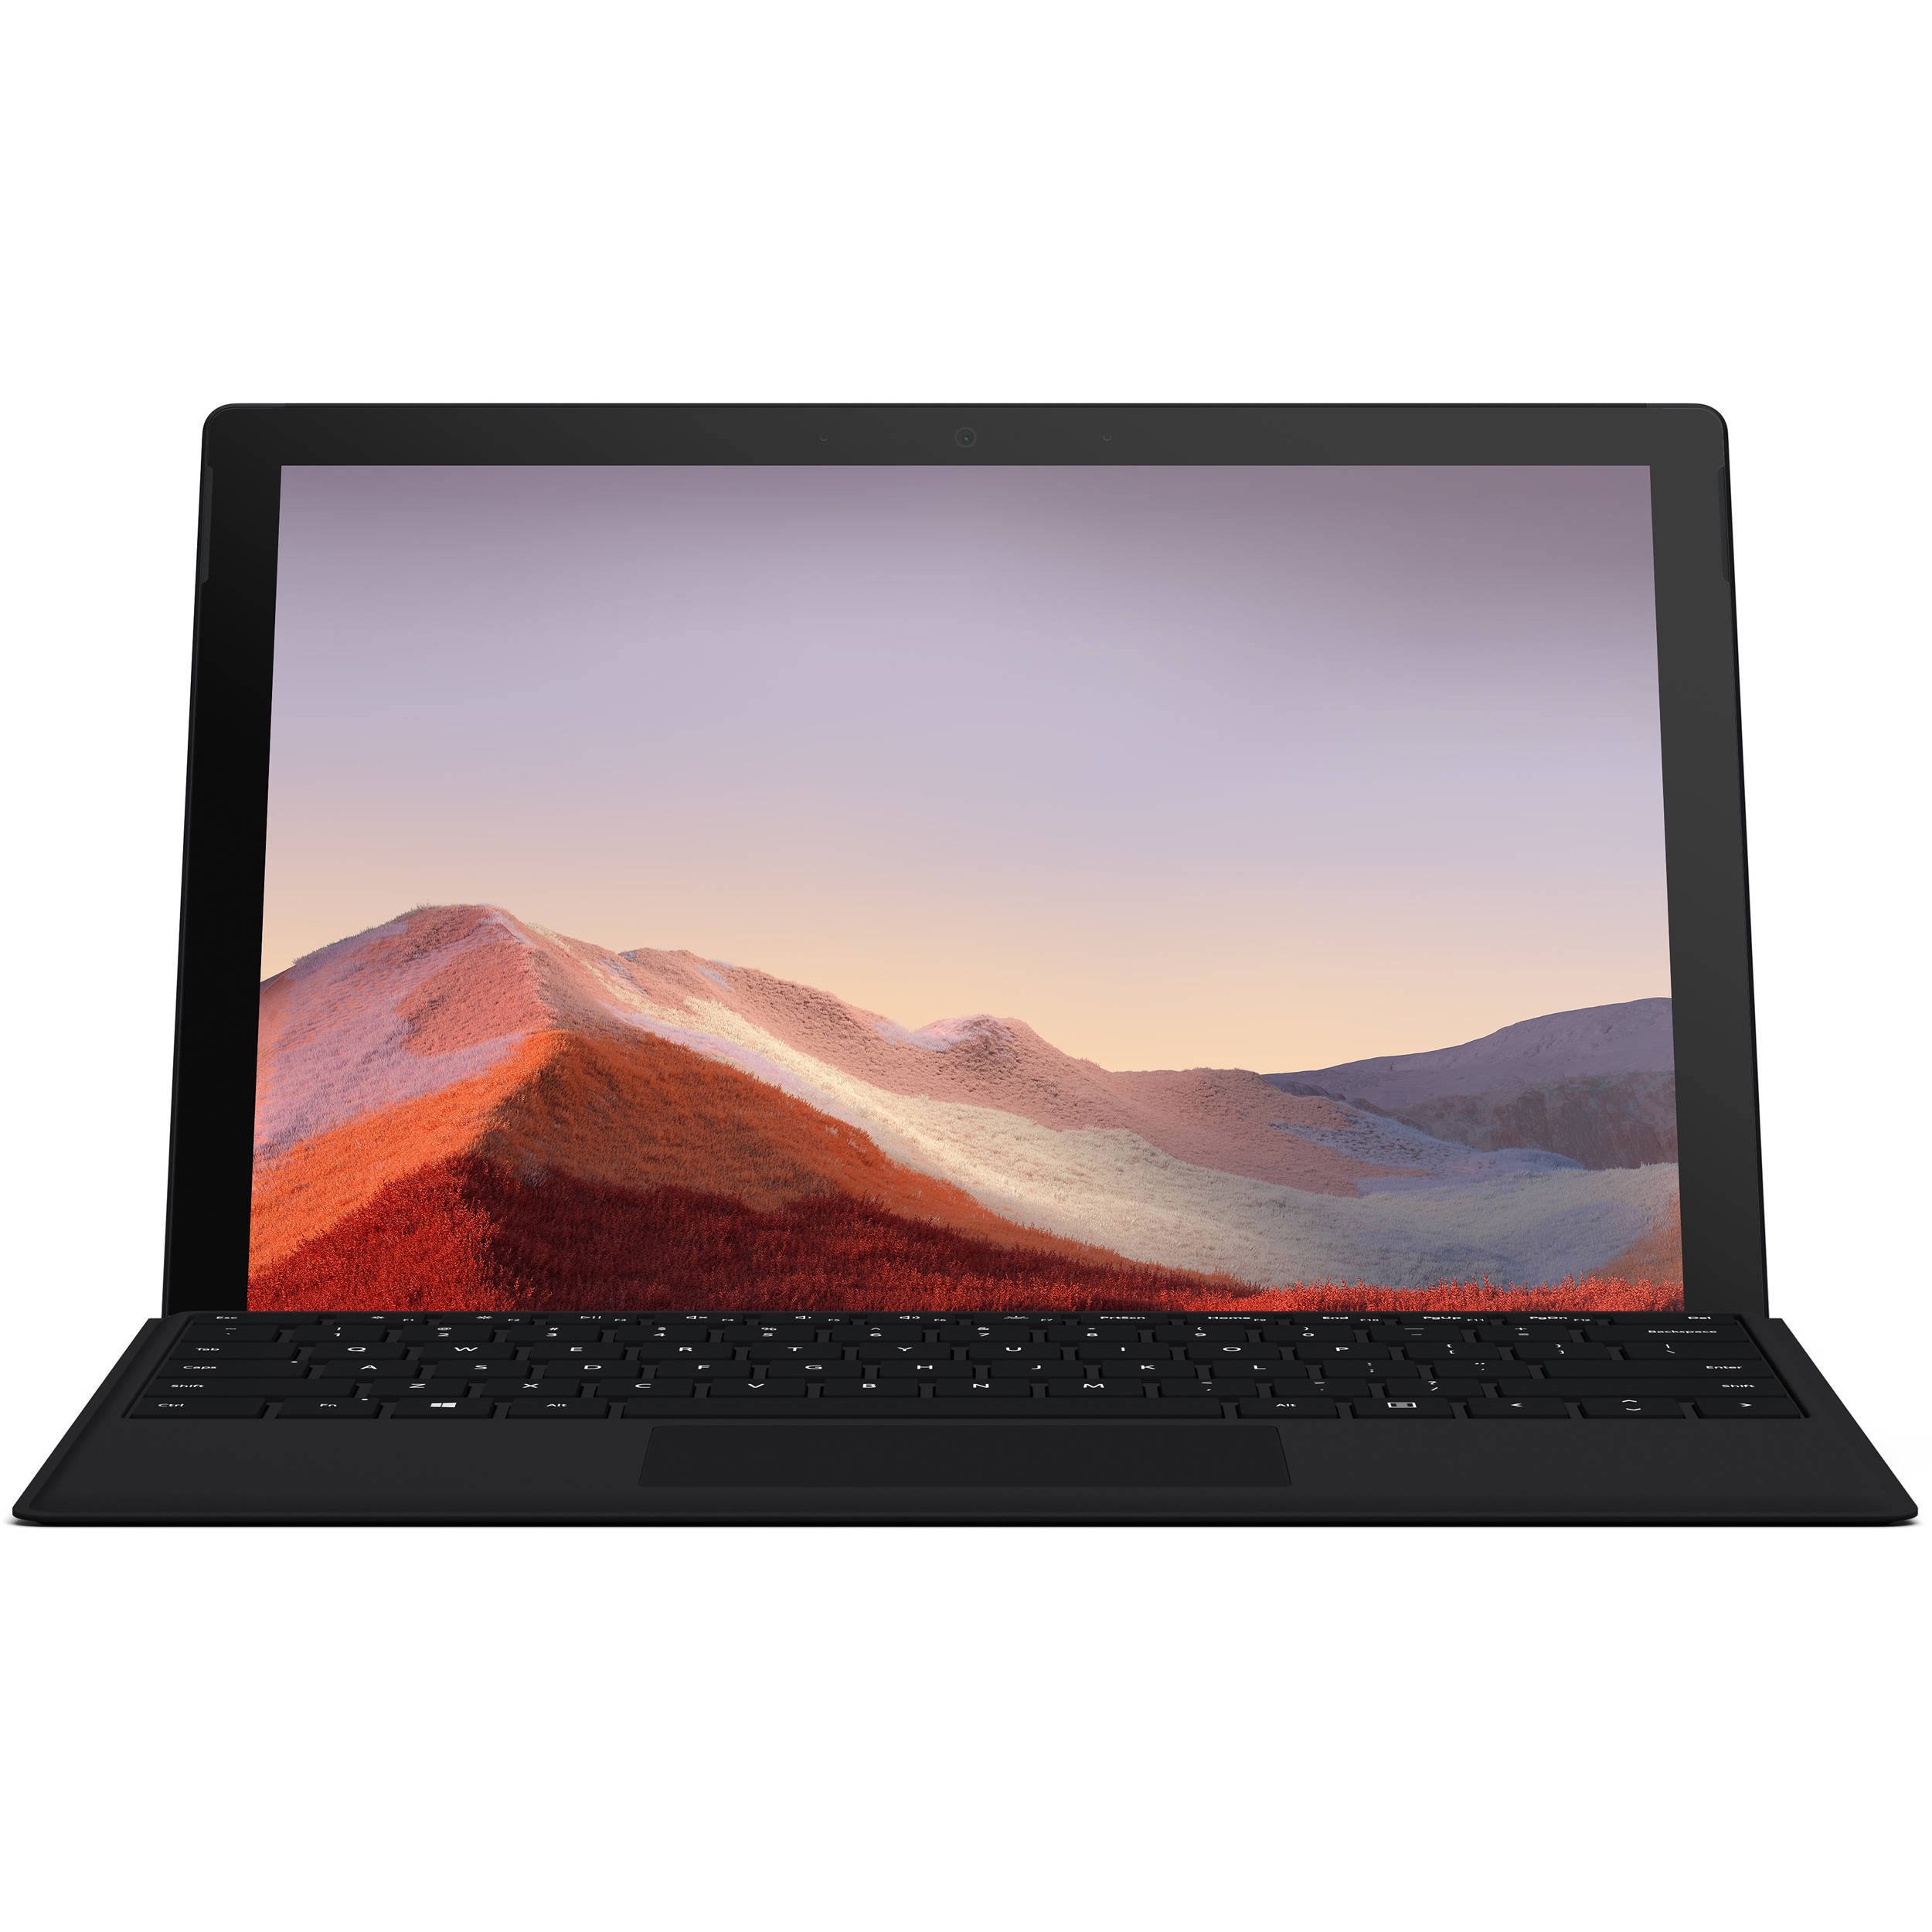 تصویر تبلت مایکروسافت مدل Surface Pro 7 - G به همراه کیبورد Black Type Cover